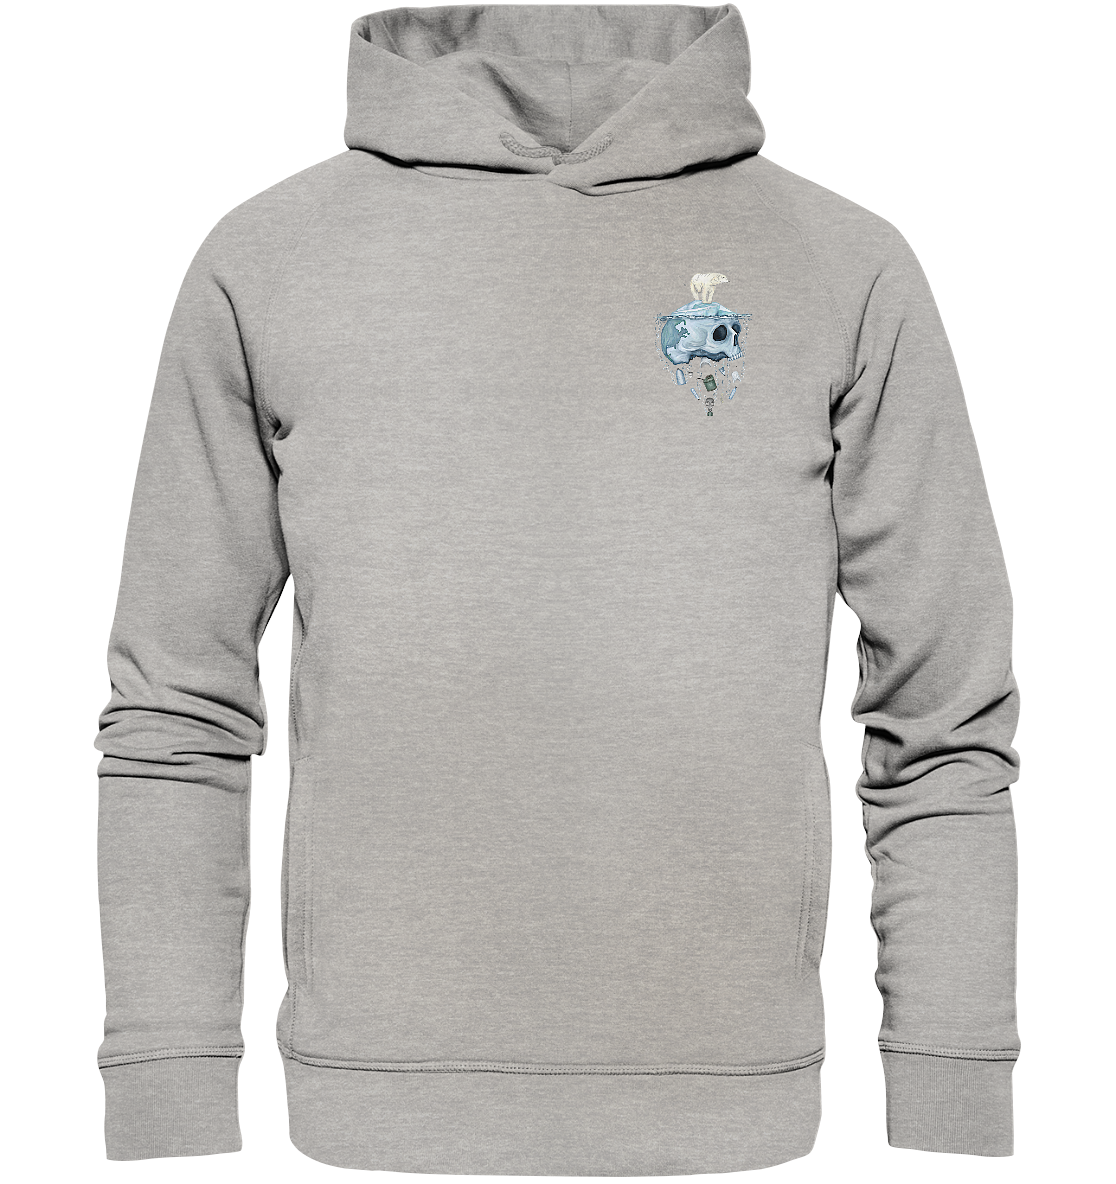 front-organic-fashion-hoodie-c2c1c0-1116x.png